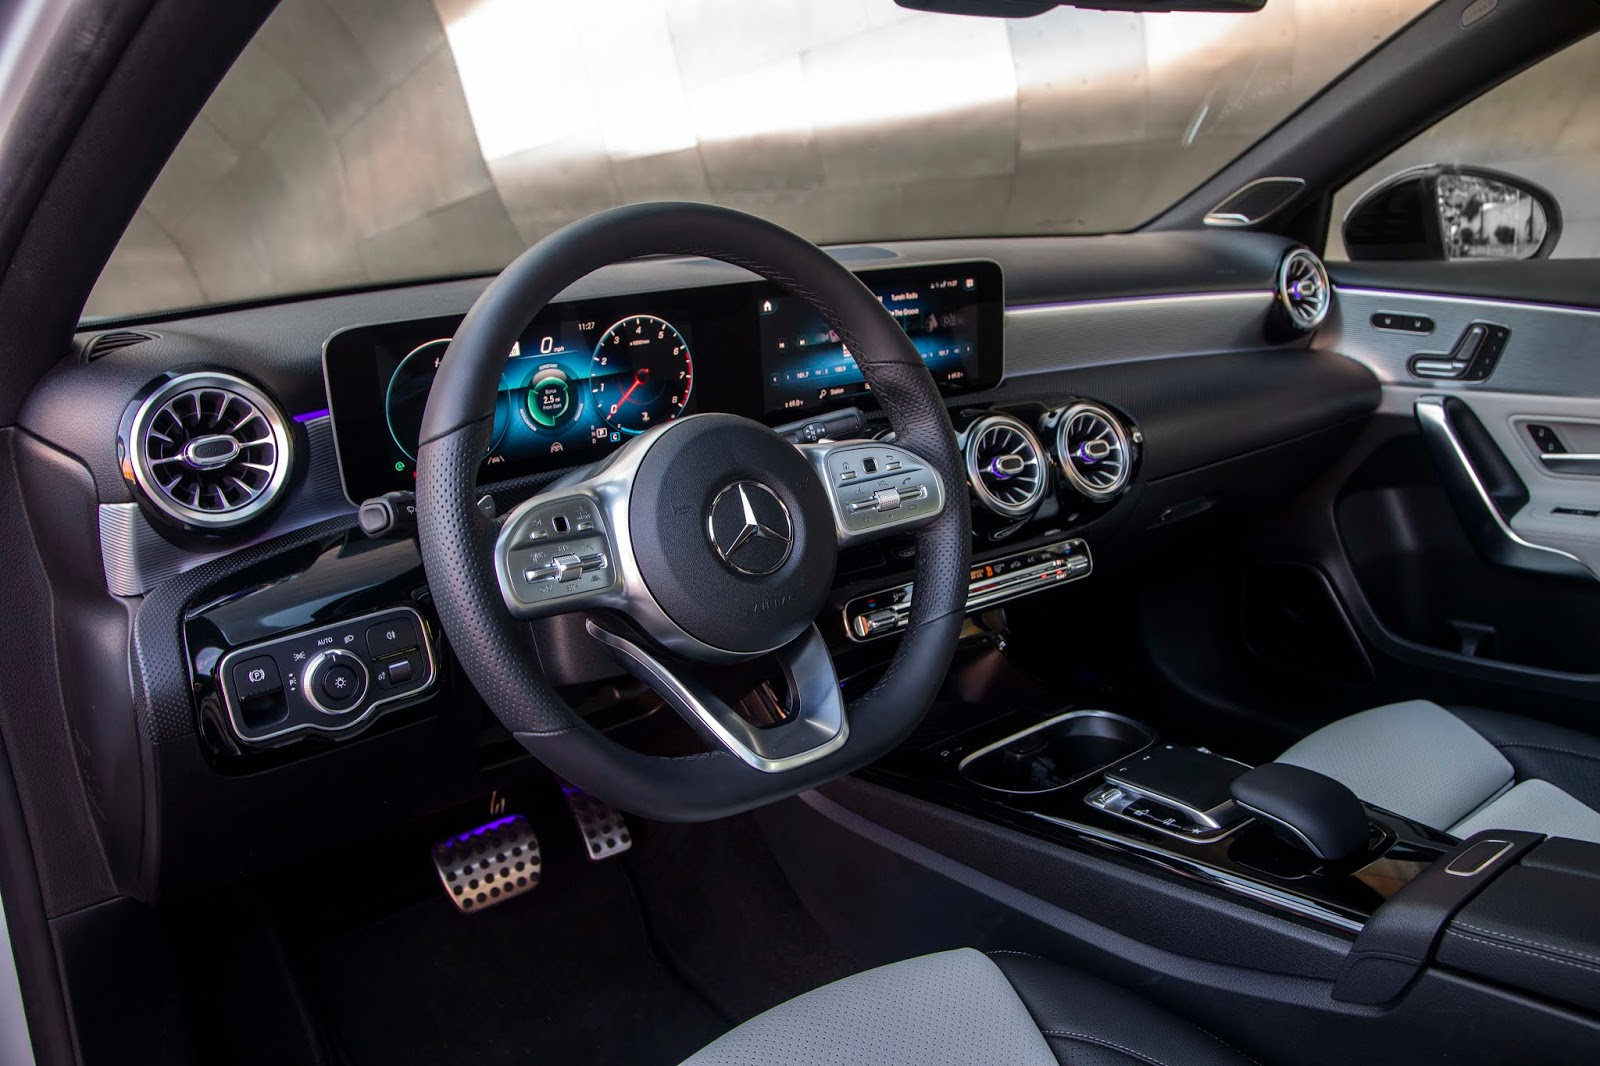 18C0775 029 Από 28.230 ευρώ η τιμή της Mercedes A-Class Sedan Luxury sedan, Mercedes, Mercedes AMG, premium sedan, sedan, zblog, καινούργιο, καινούρια, τιμες